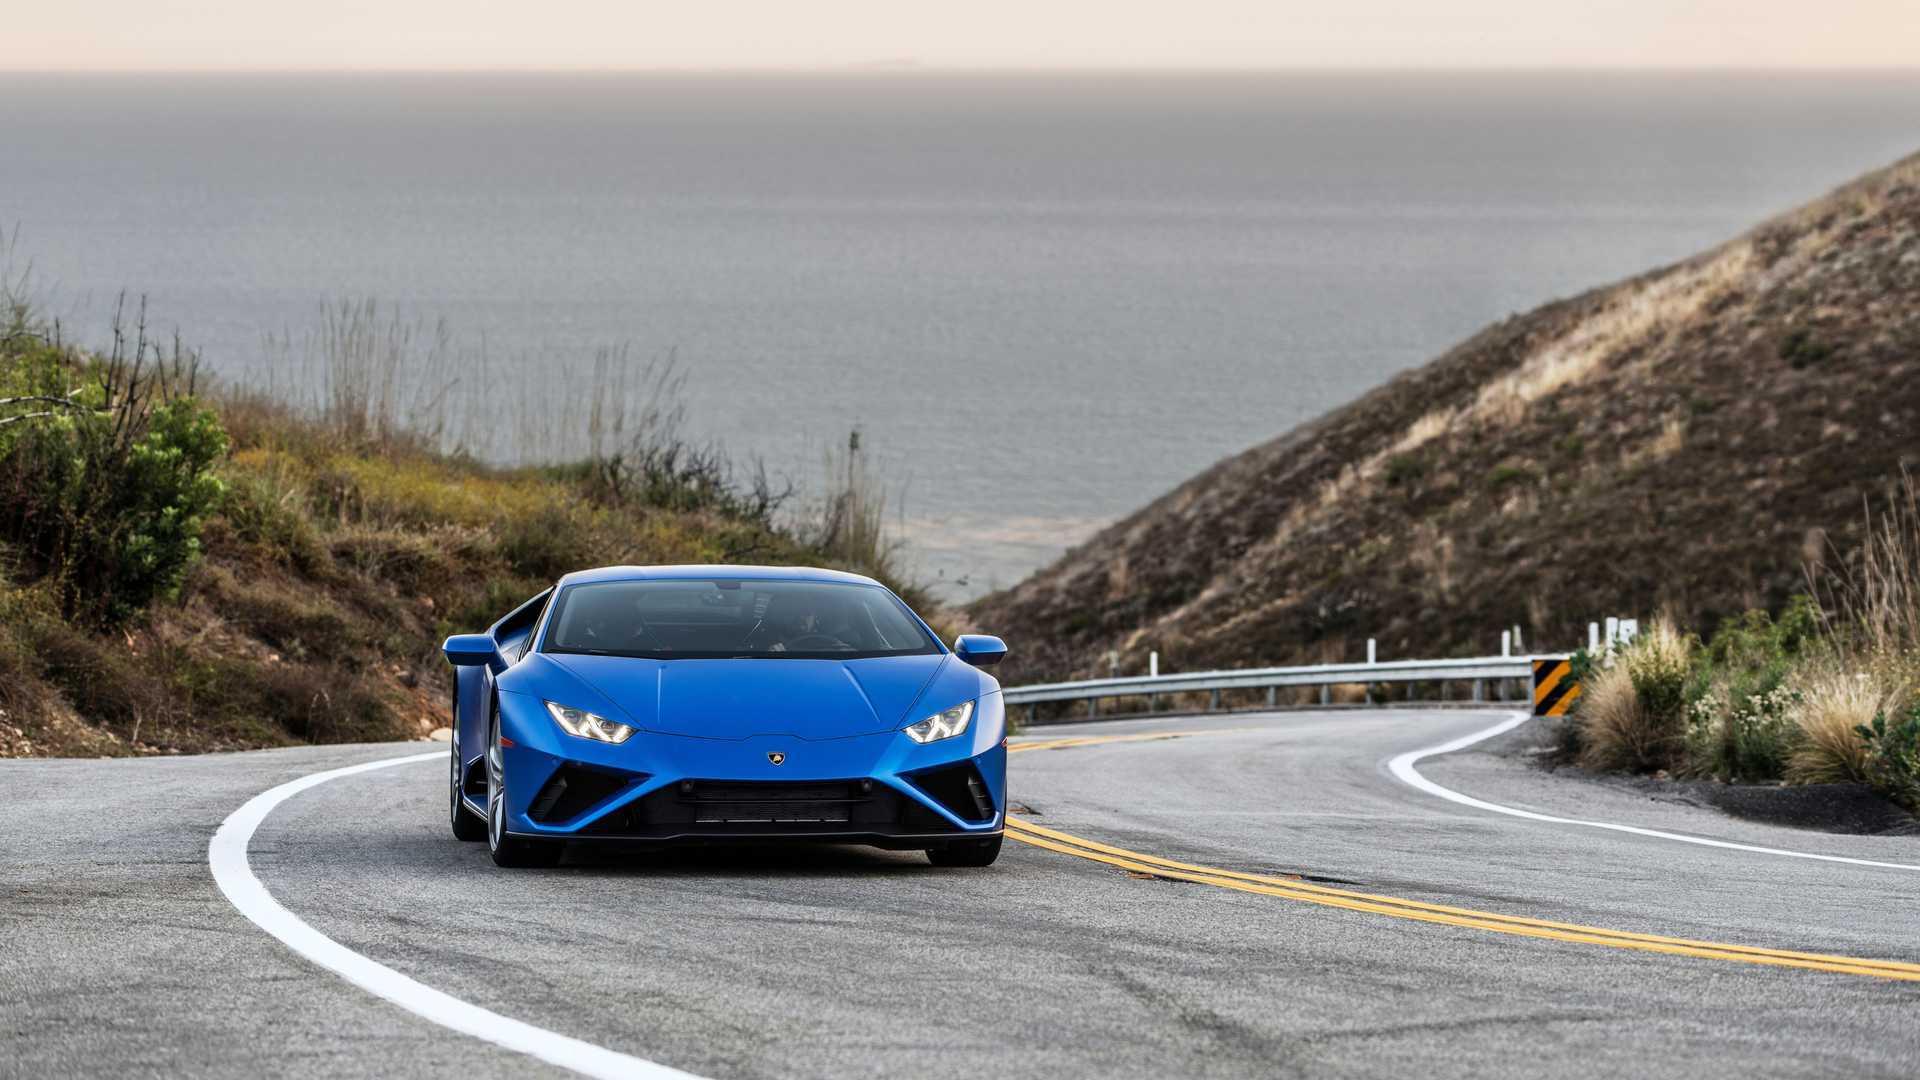 2020 Lamborghini Huracan Evo RWD front action